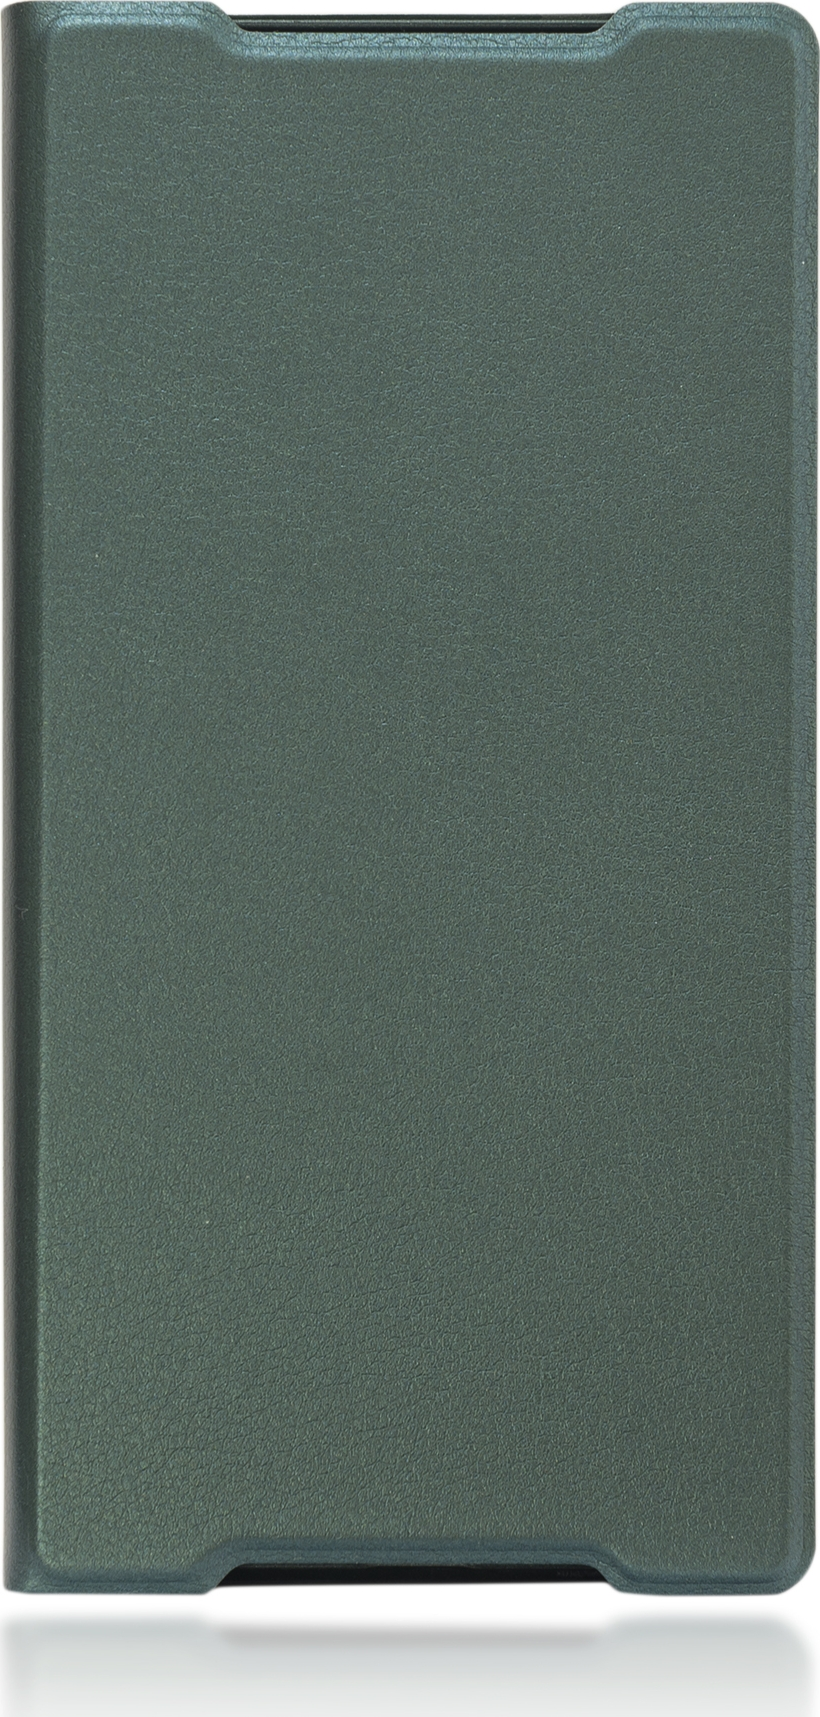 Чехол Brosco Book для Sony Xperia Z5, зеленый цена